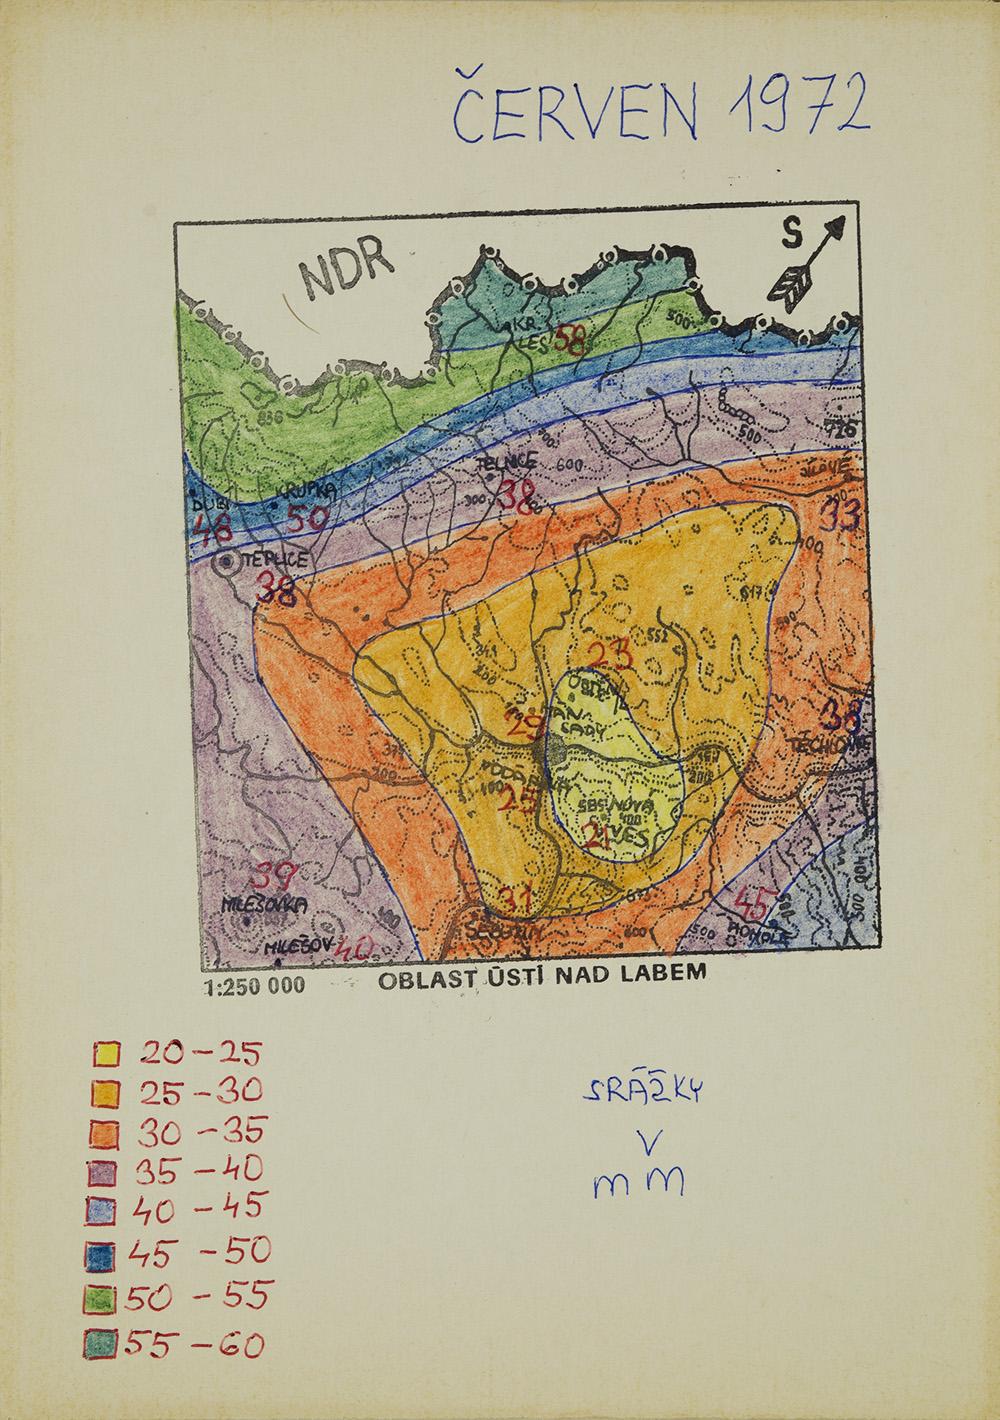 Zdenek Kosek    Cerven 1972  , c. 1991 Ballpoint pen/marker, paper 8.25 x 6 in (21.0 x 15.2 cm) ZKo 69